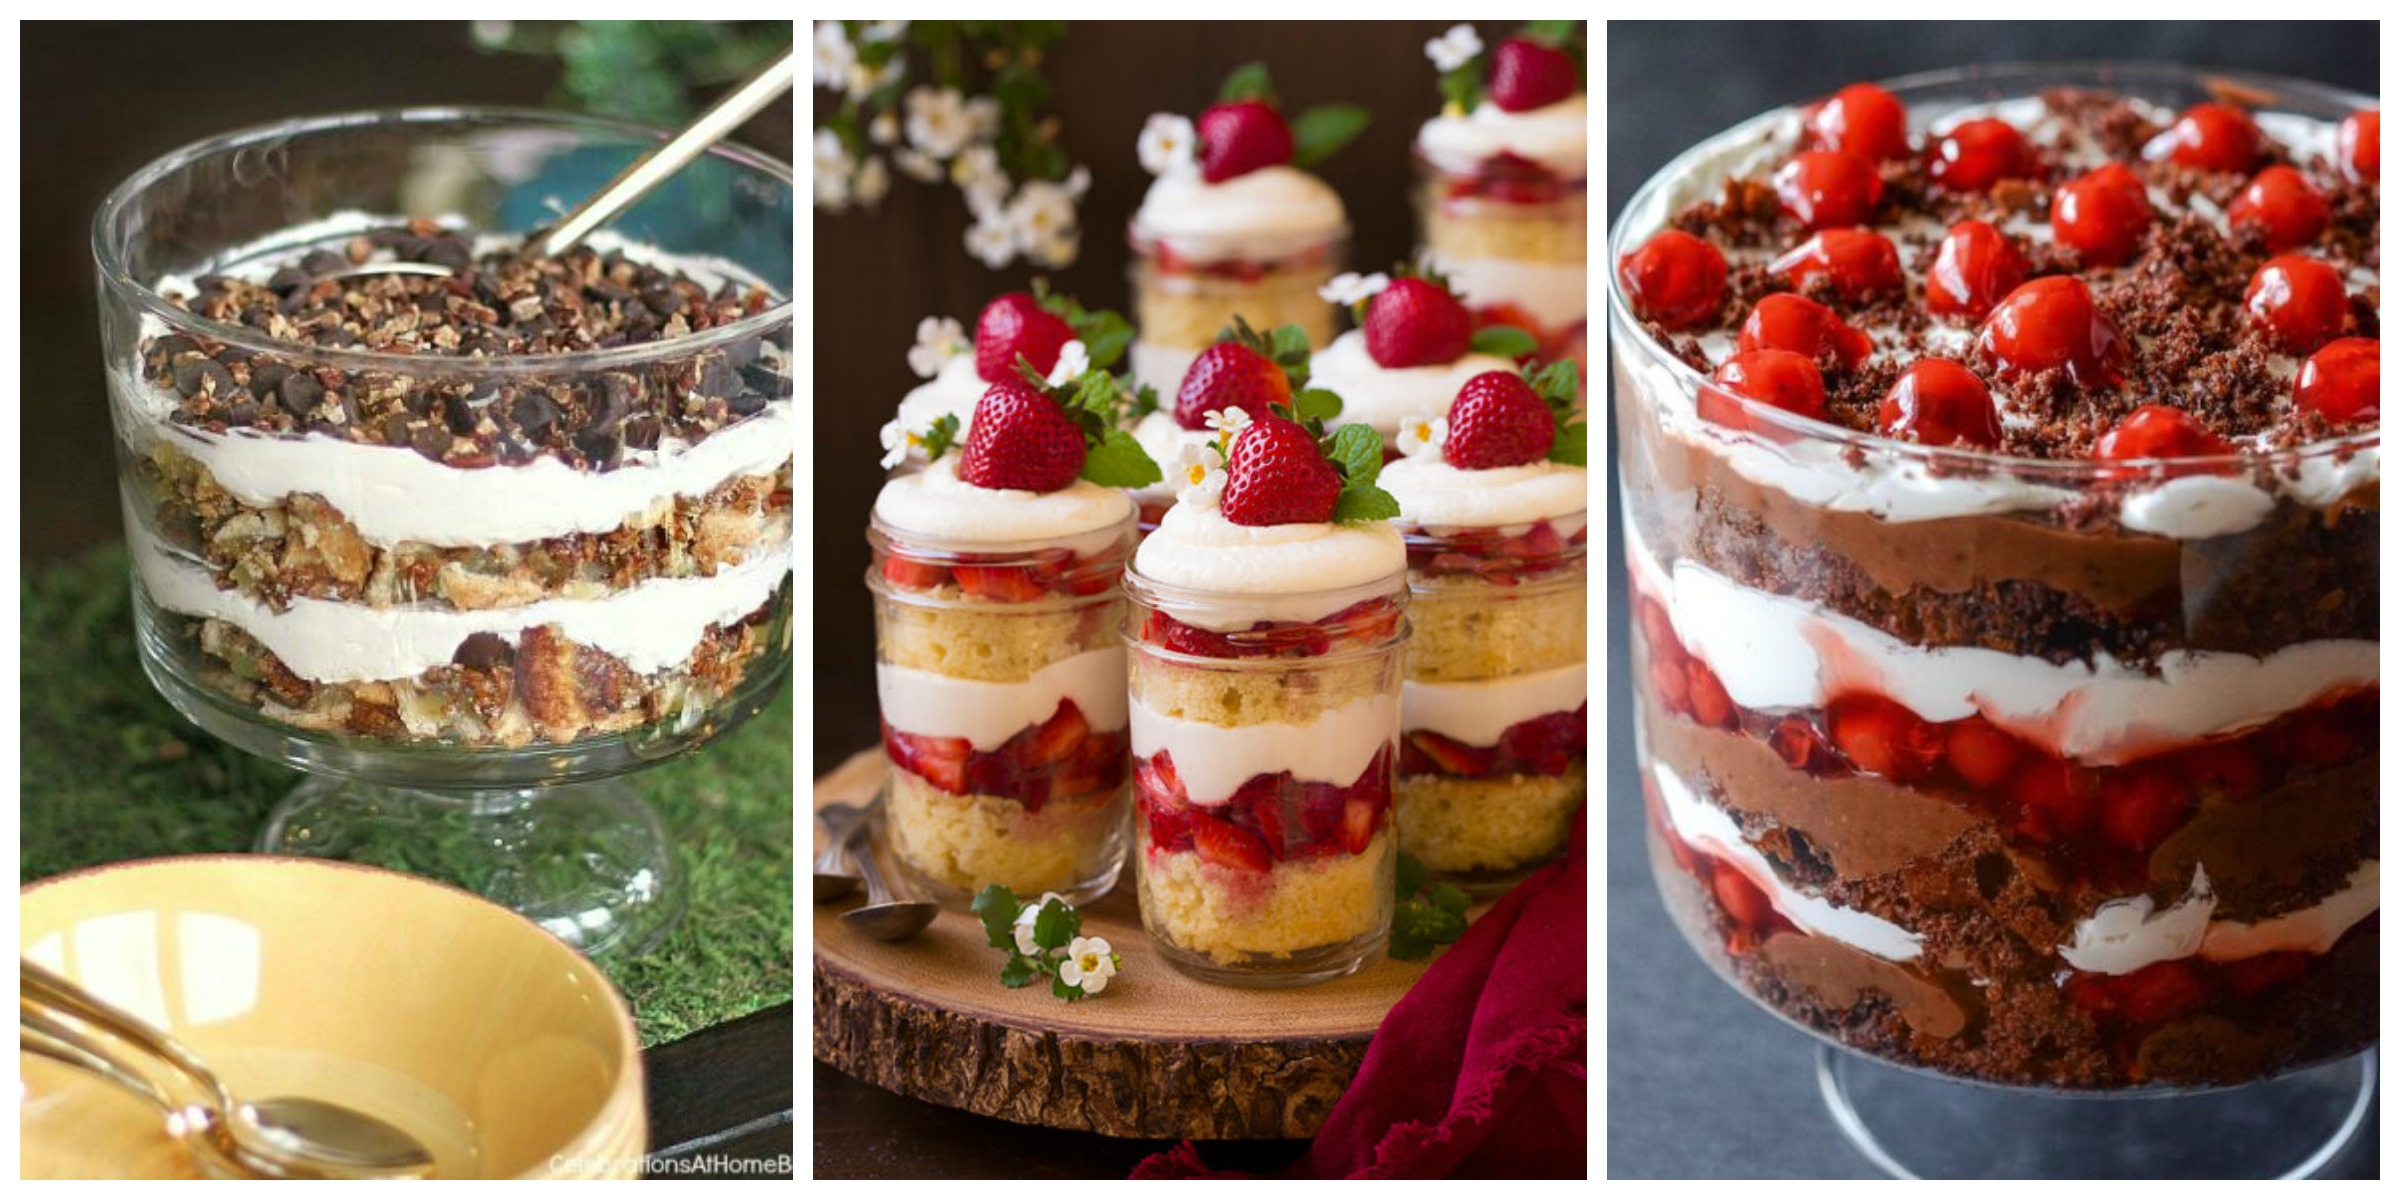 15 easy trifle recipes how to make a christmas trifle for Quick and easy trifle dessert recipes